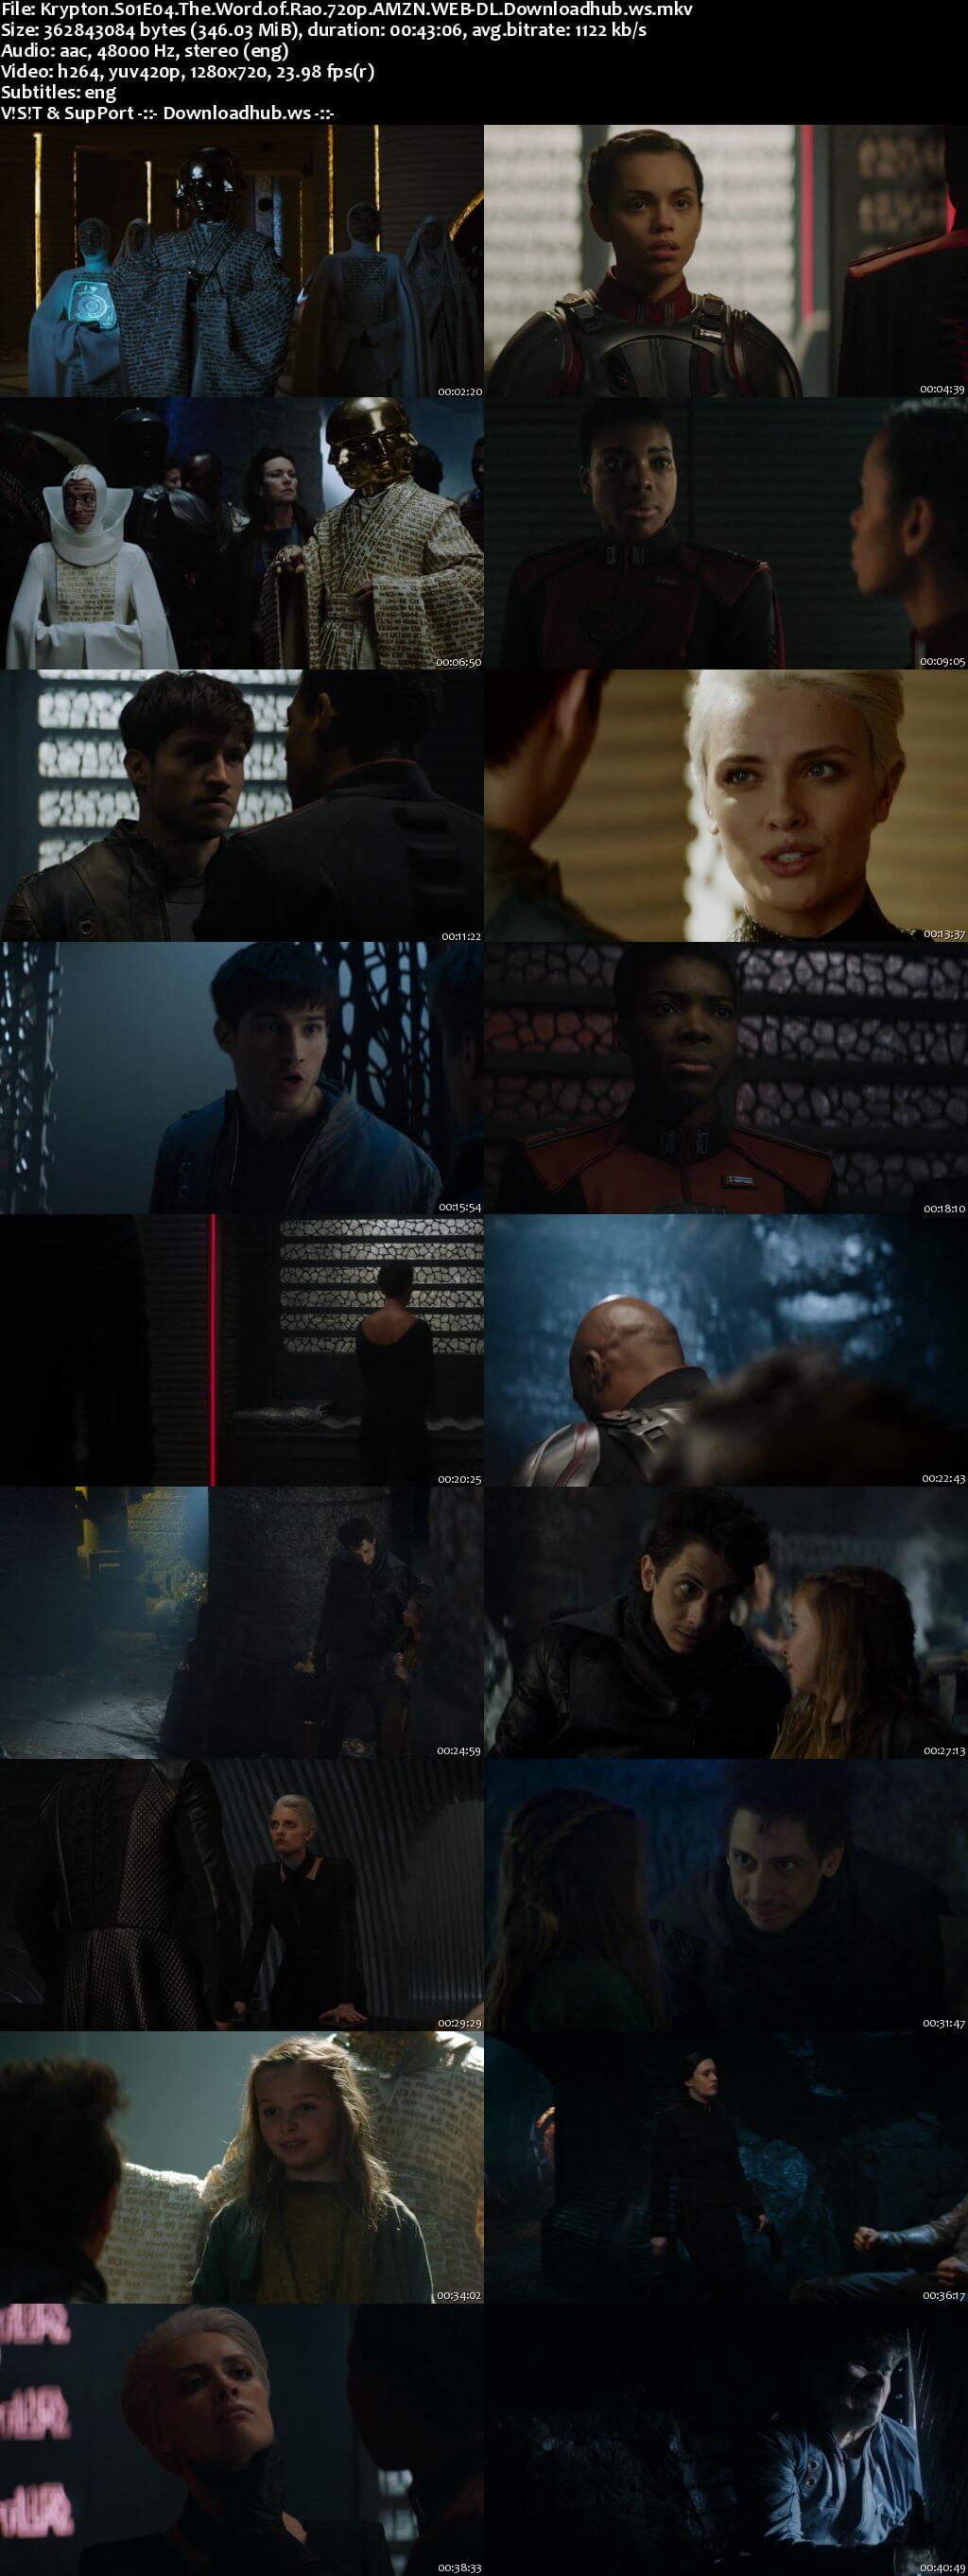 Krypton S01E04 340MB WEB-DL 720p ESubs